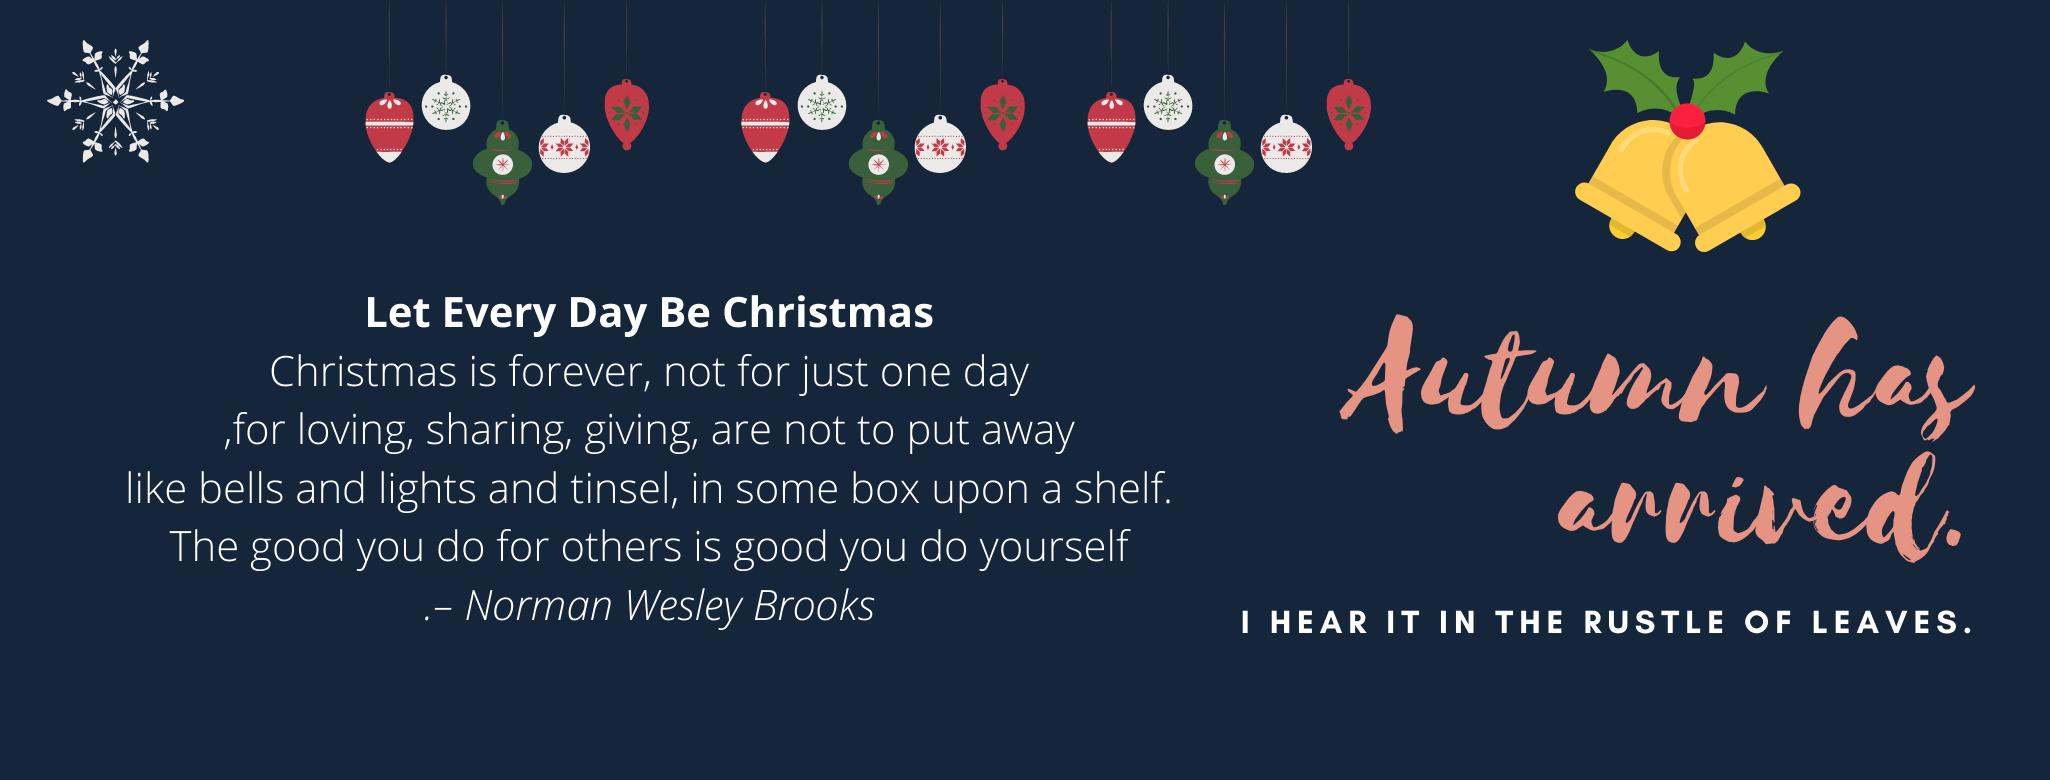 Christmas poems for preschoolers